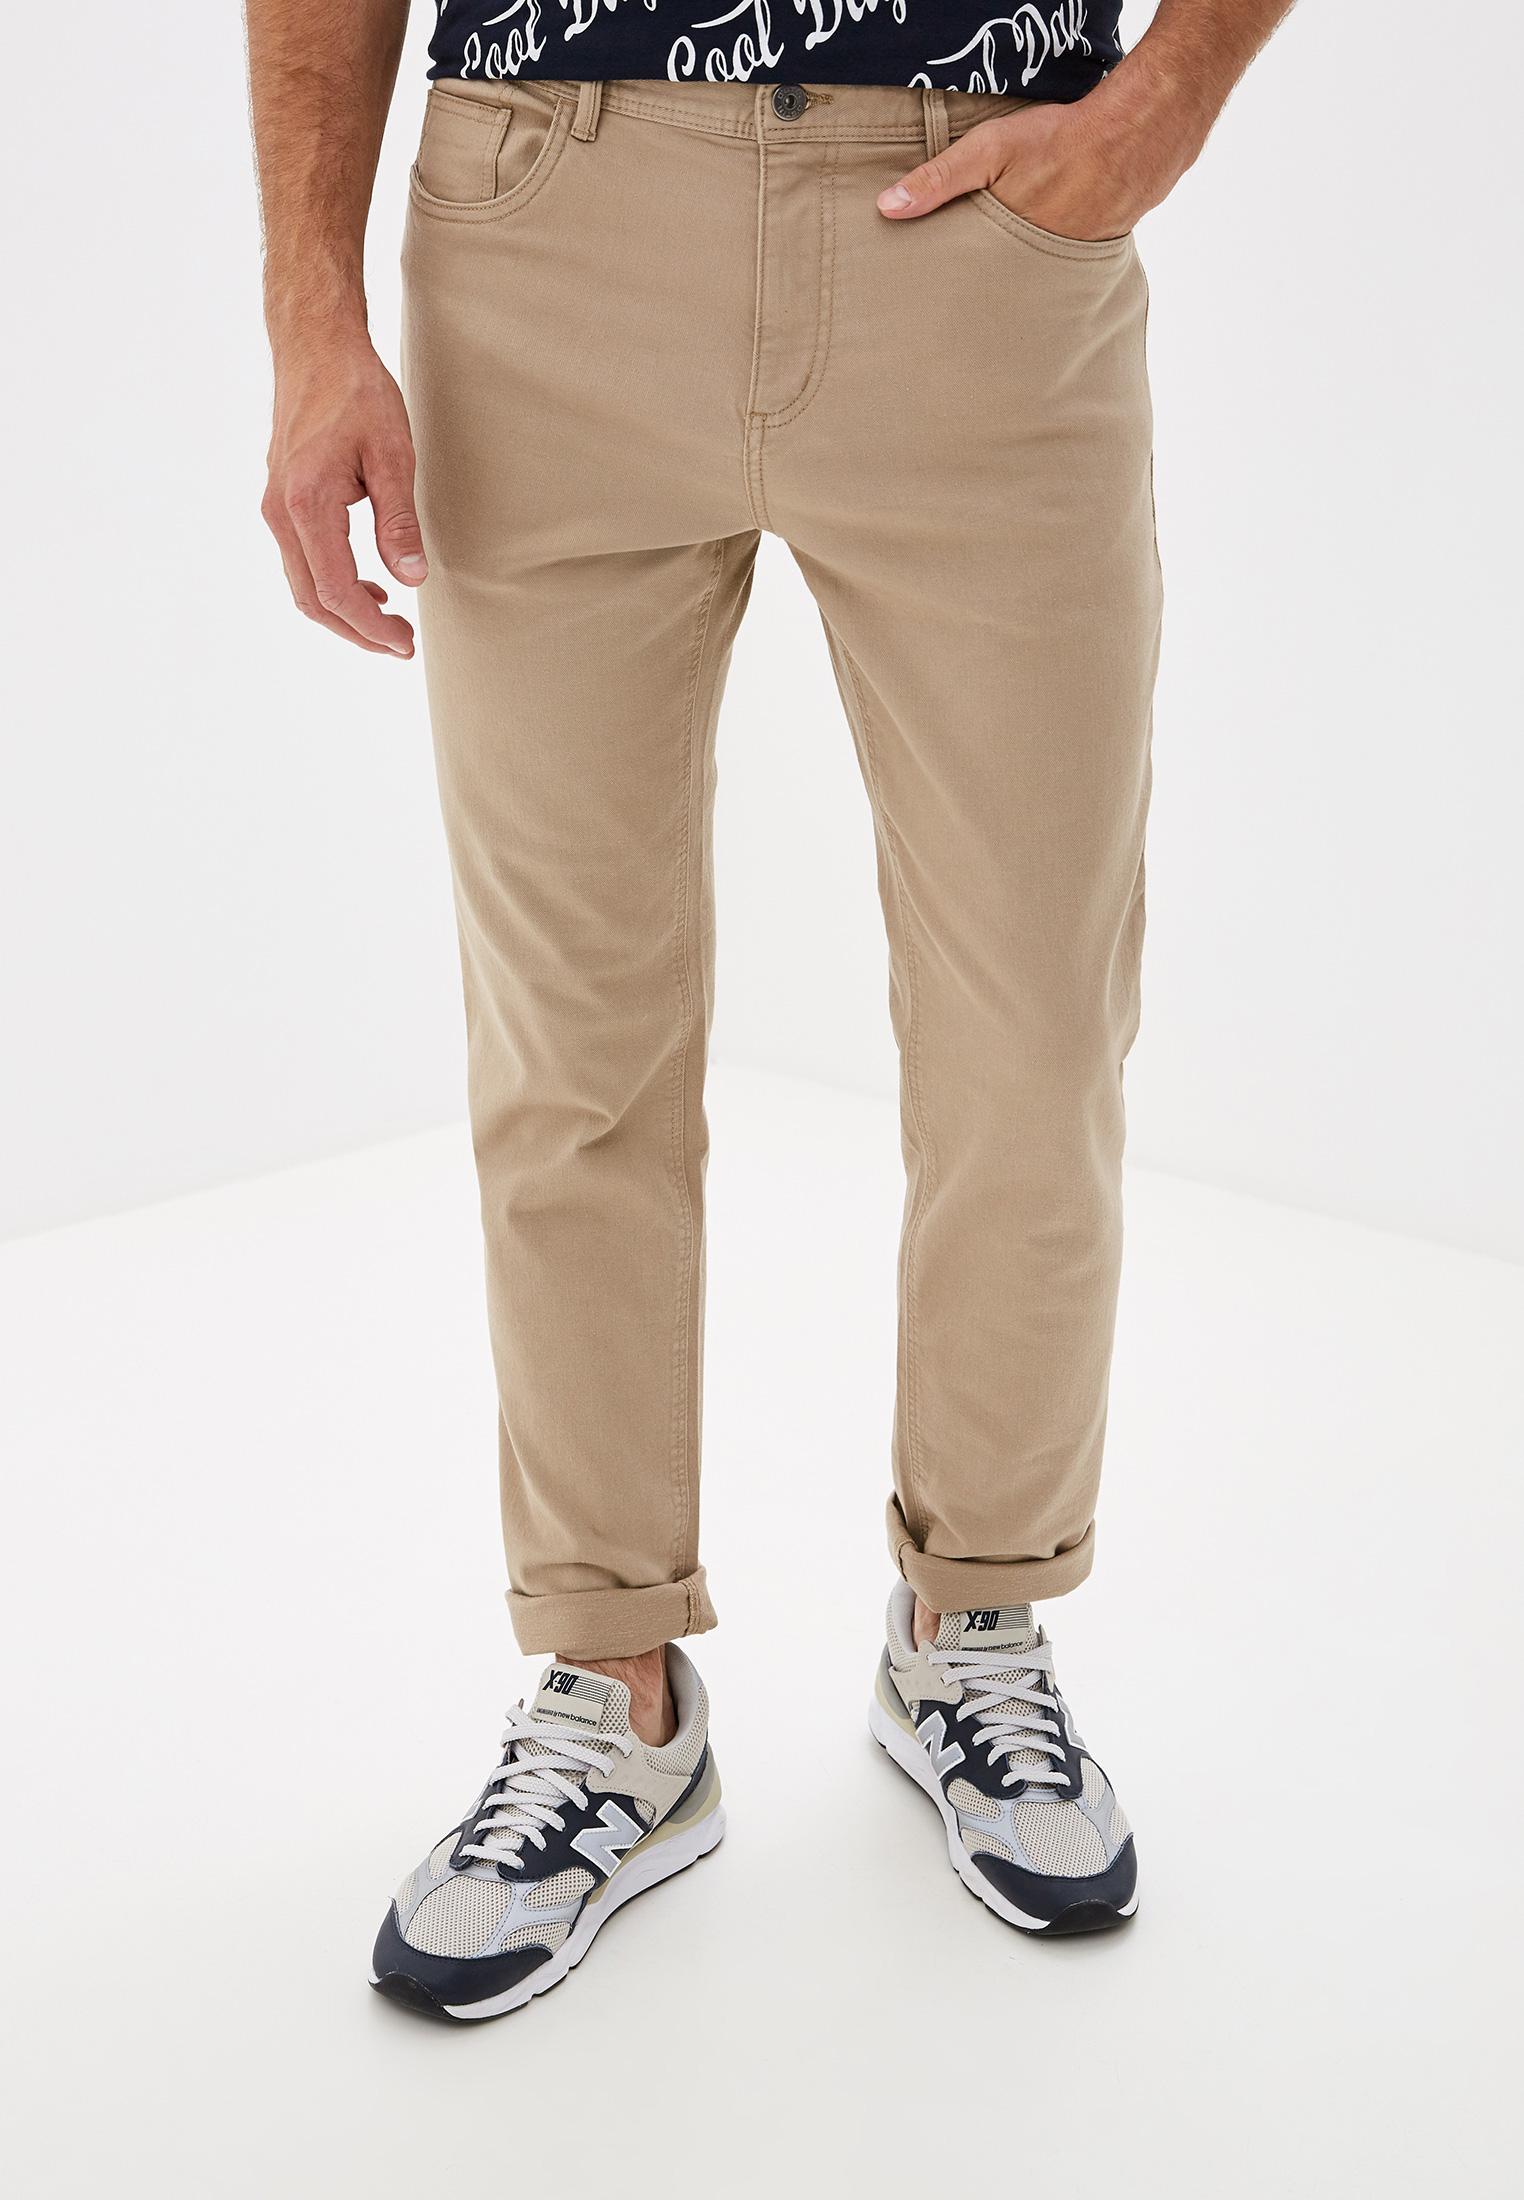 Мужские зауженные брюки O'stin MP6V33